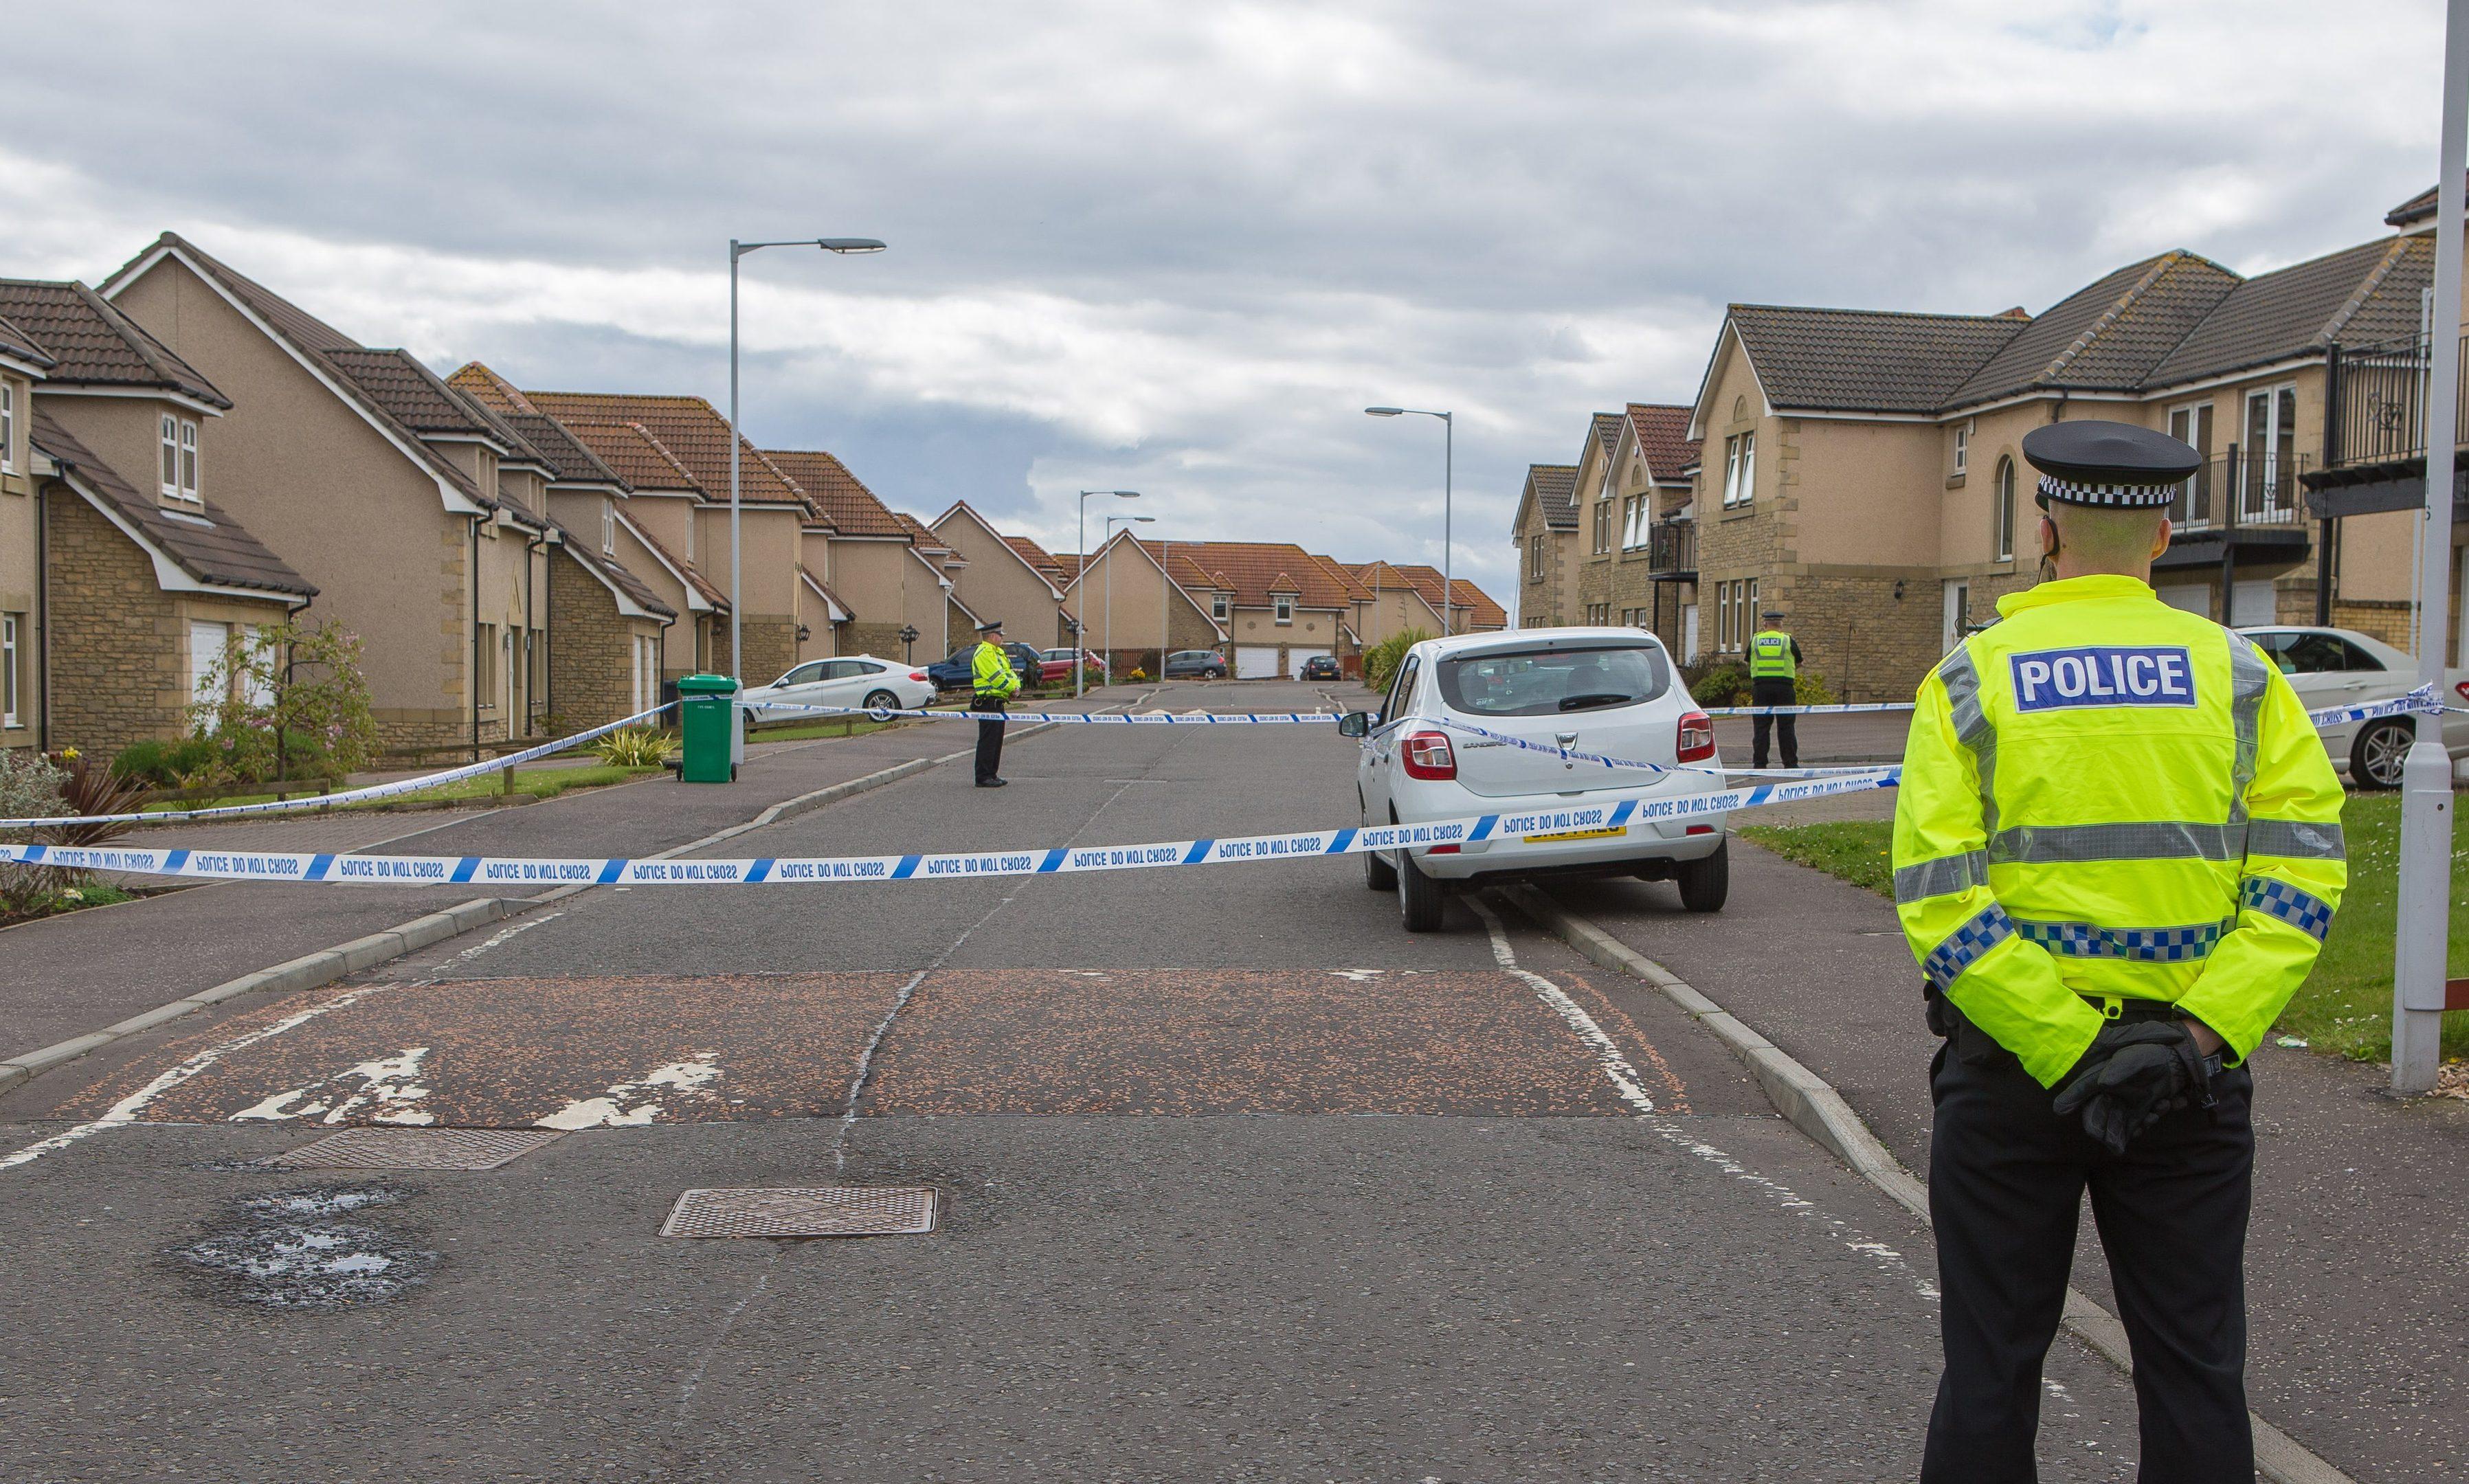 Police Scotland cordon off the scene after the reports of gunfire.